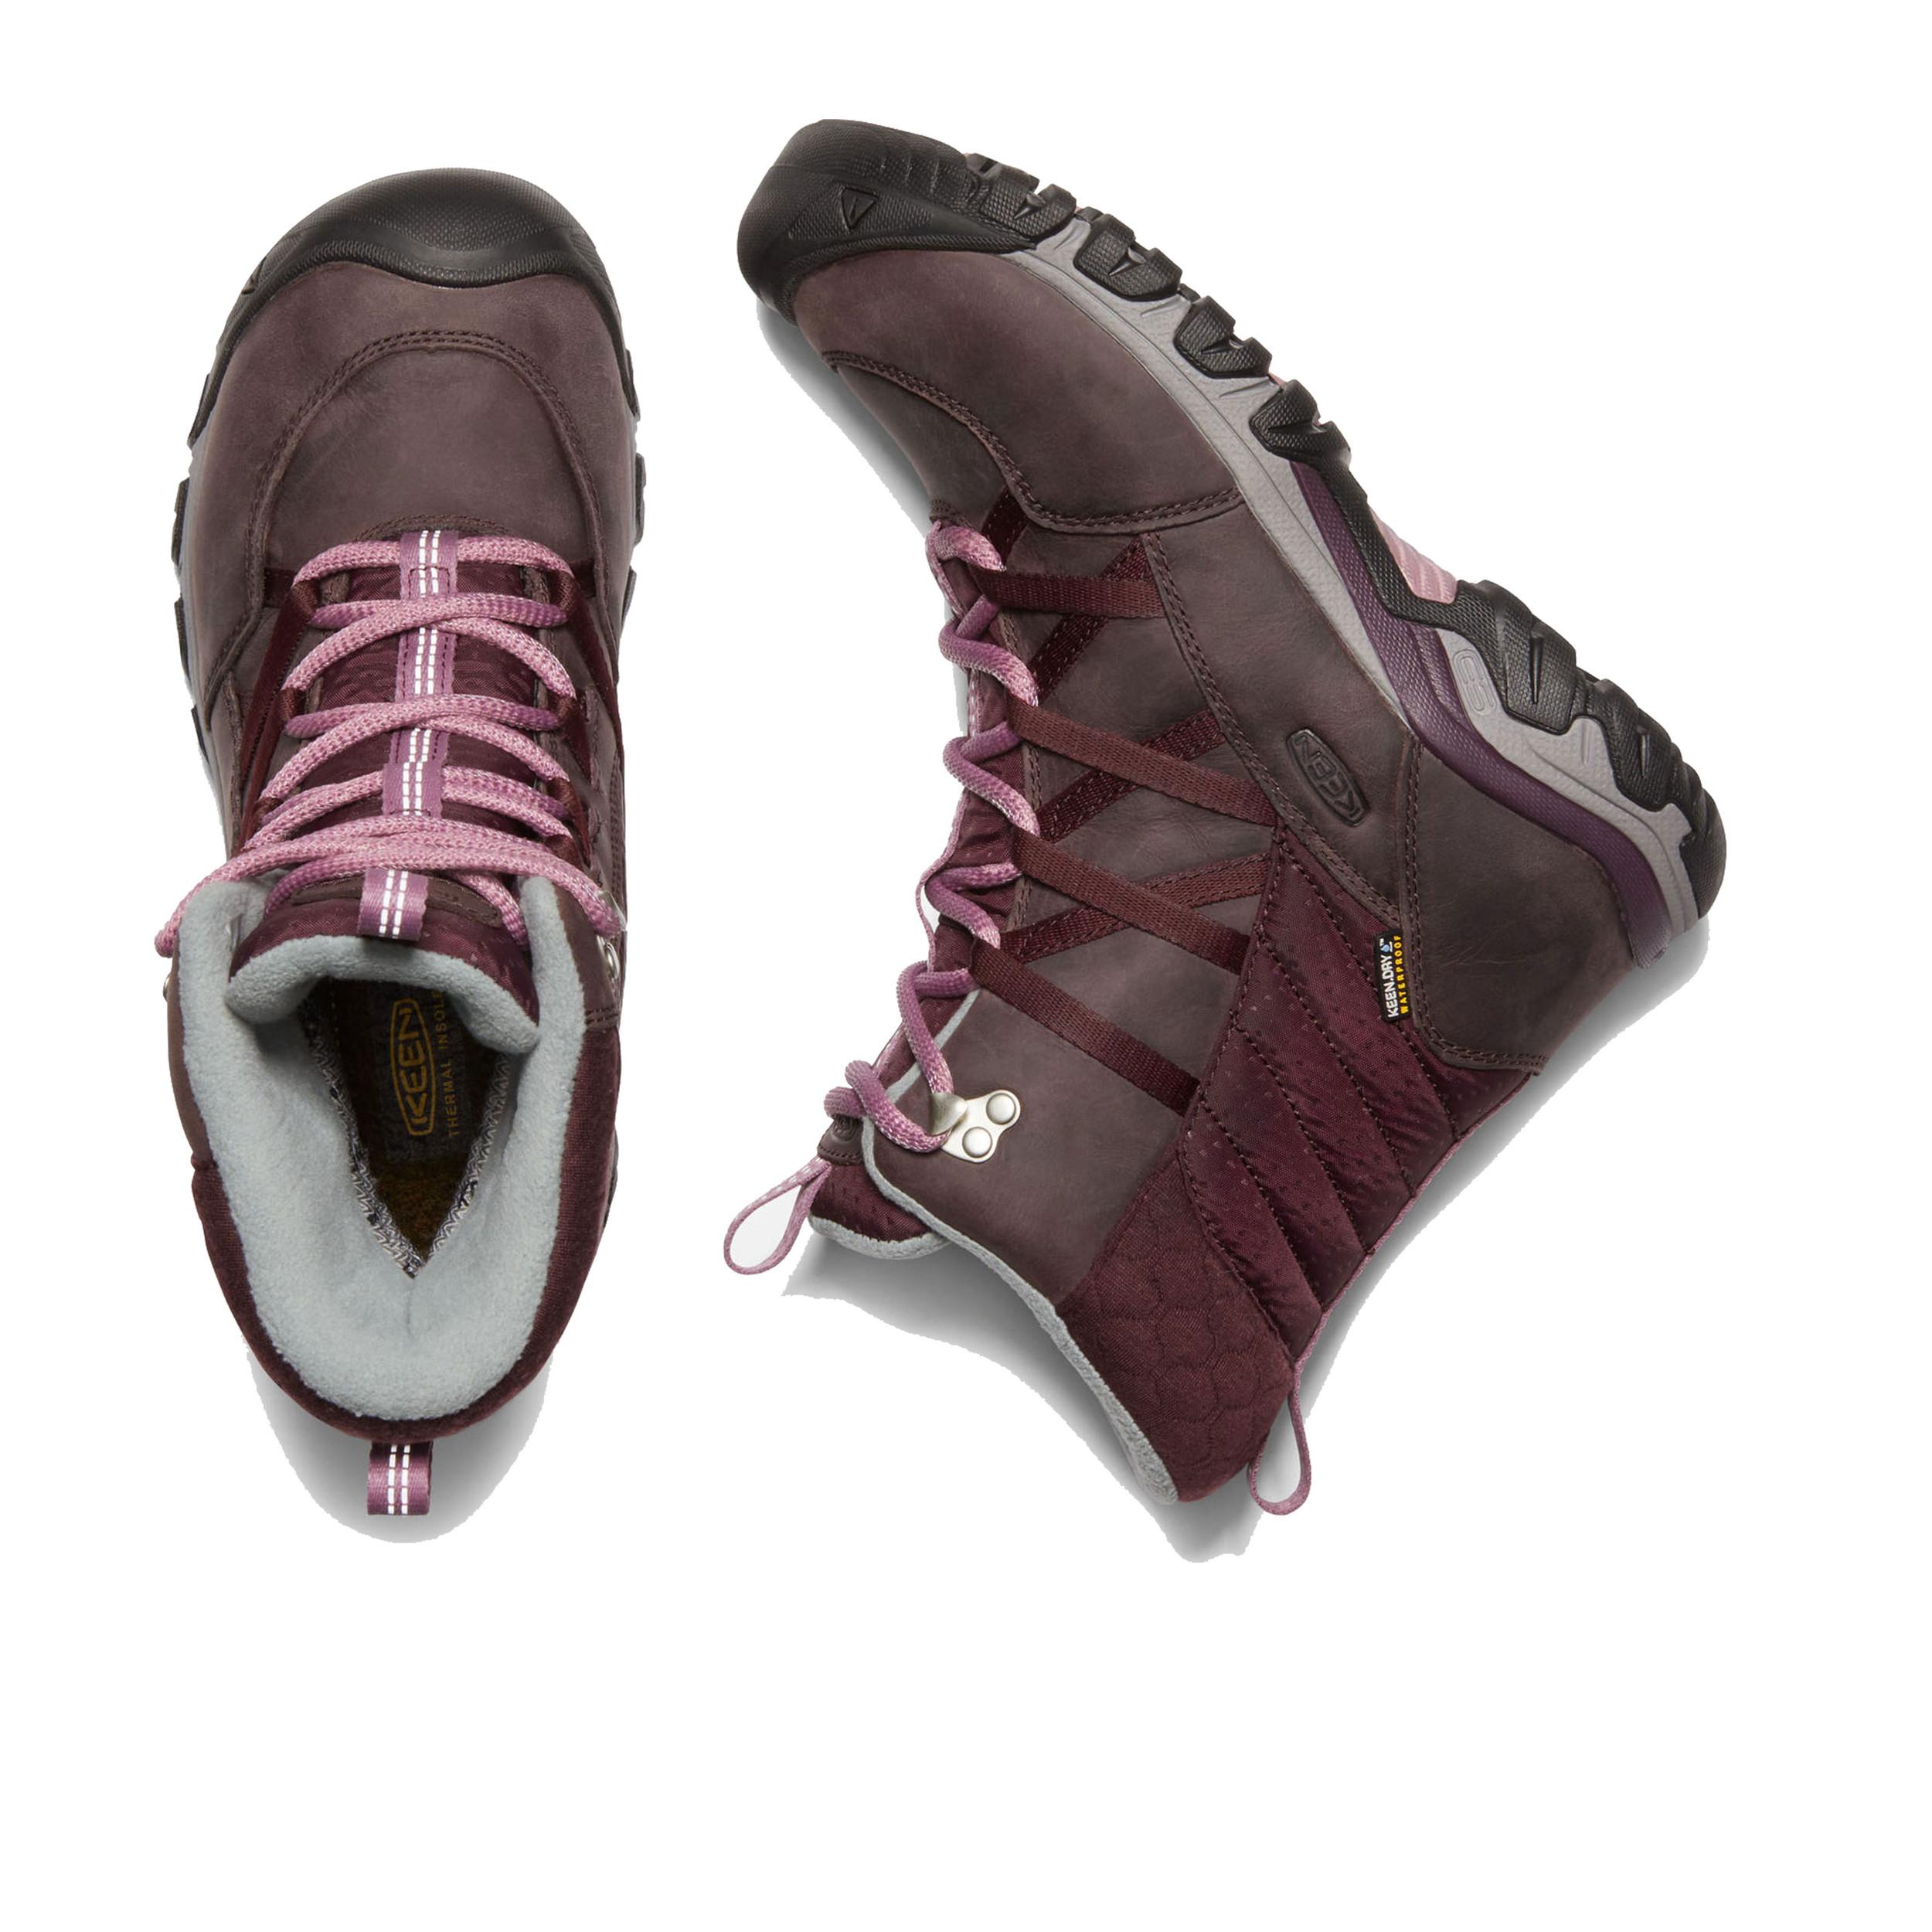 12222a50b5 Keen Womens Hoodoo III Lace Up Walking Shoes Pink Purple Sports Outdoors  Warm